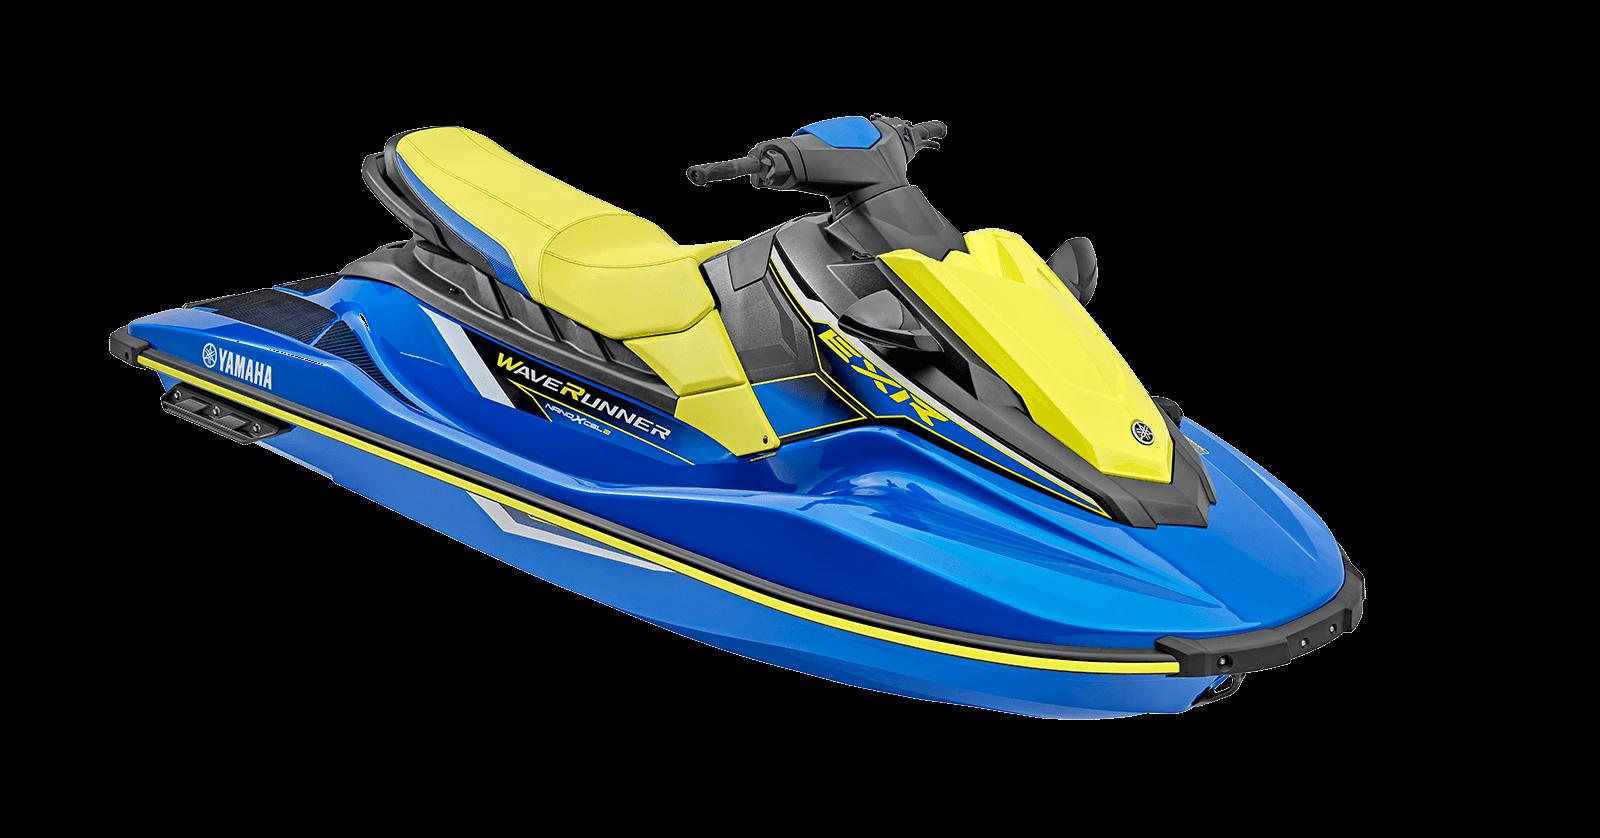 Yamaha Waverunner Models